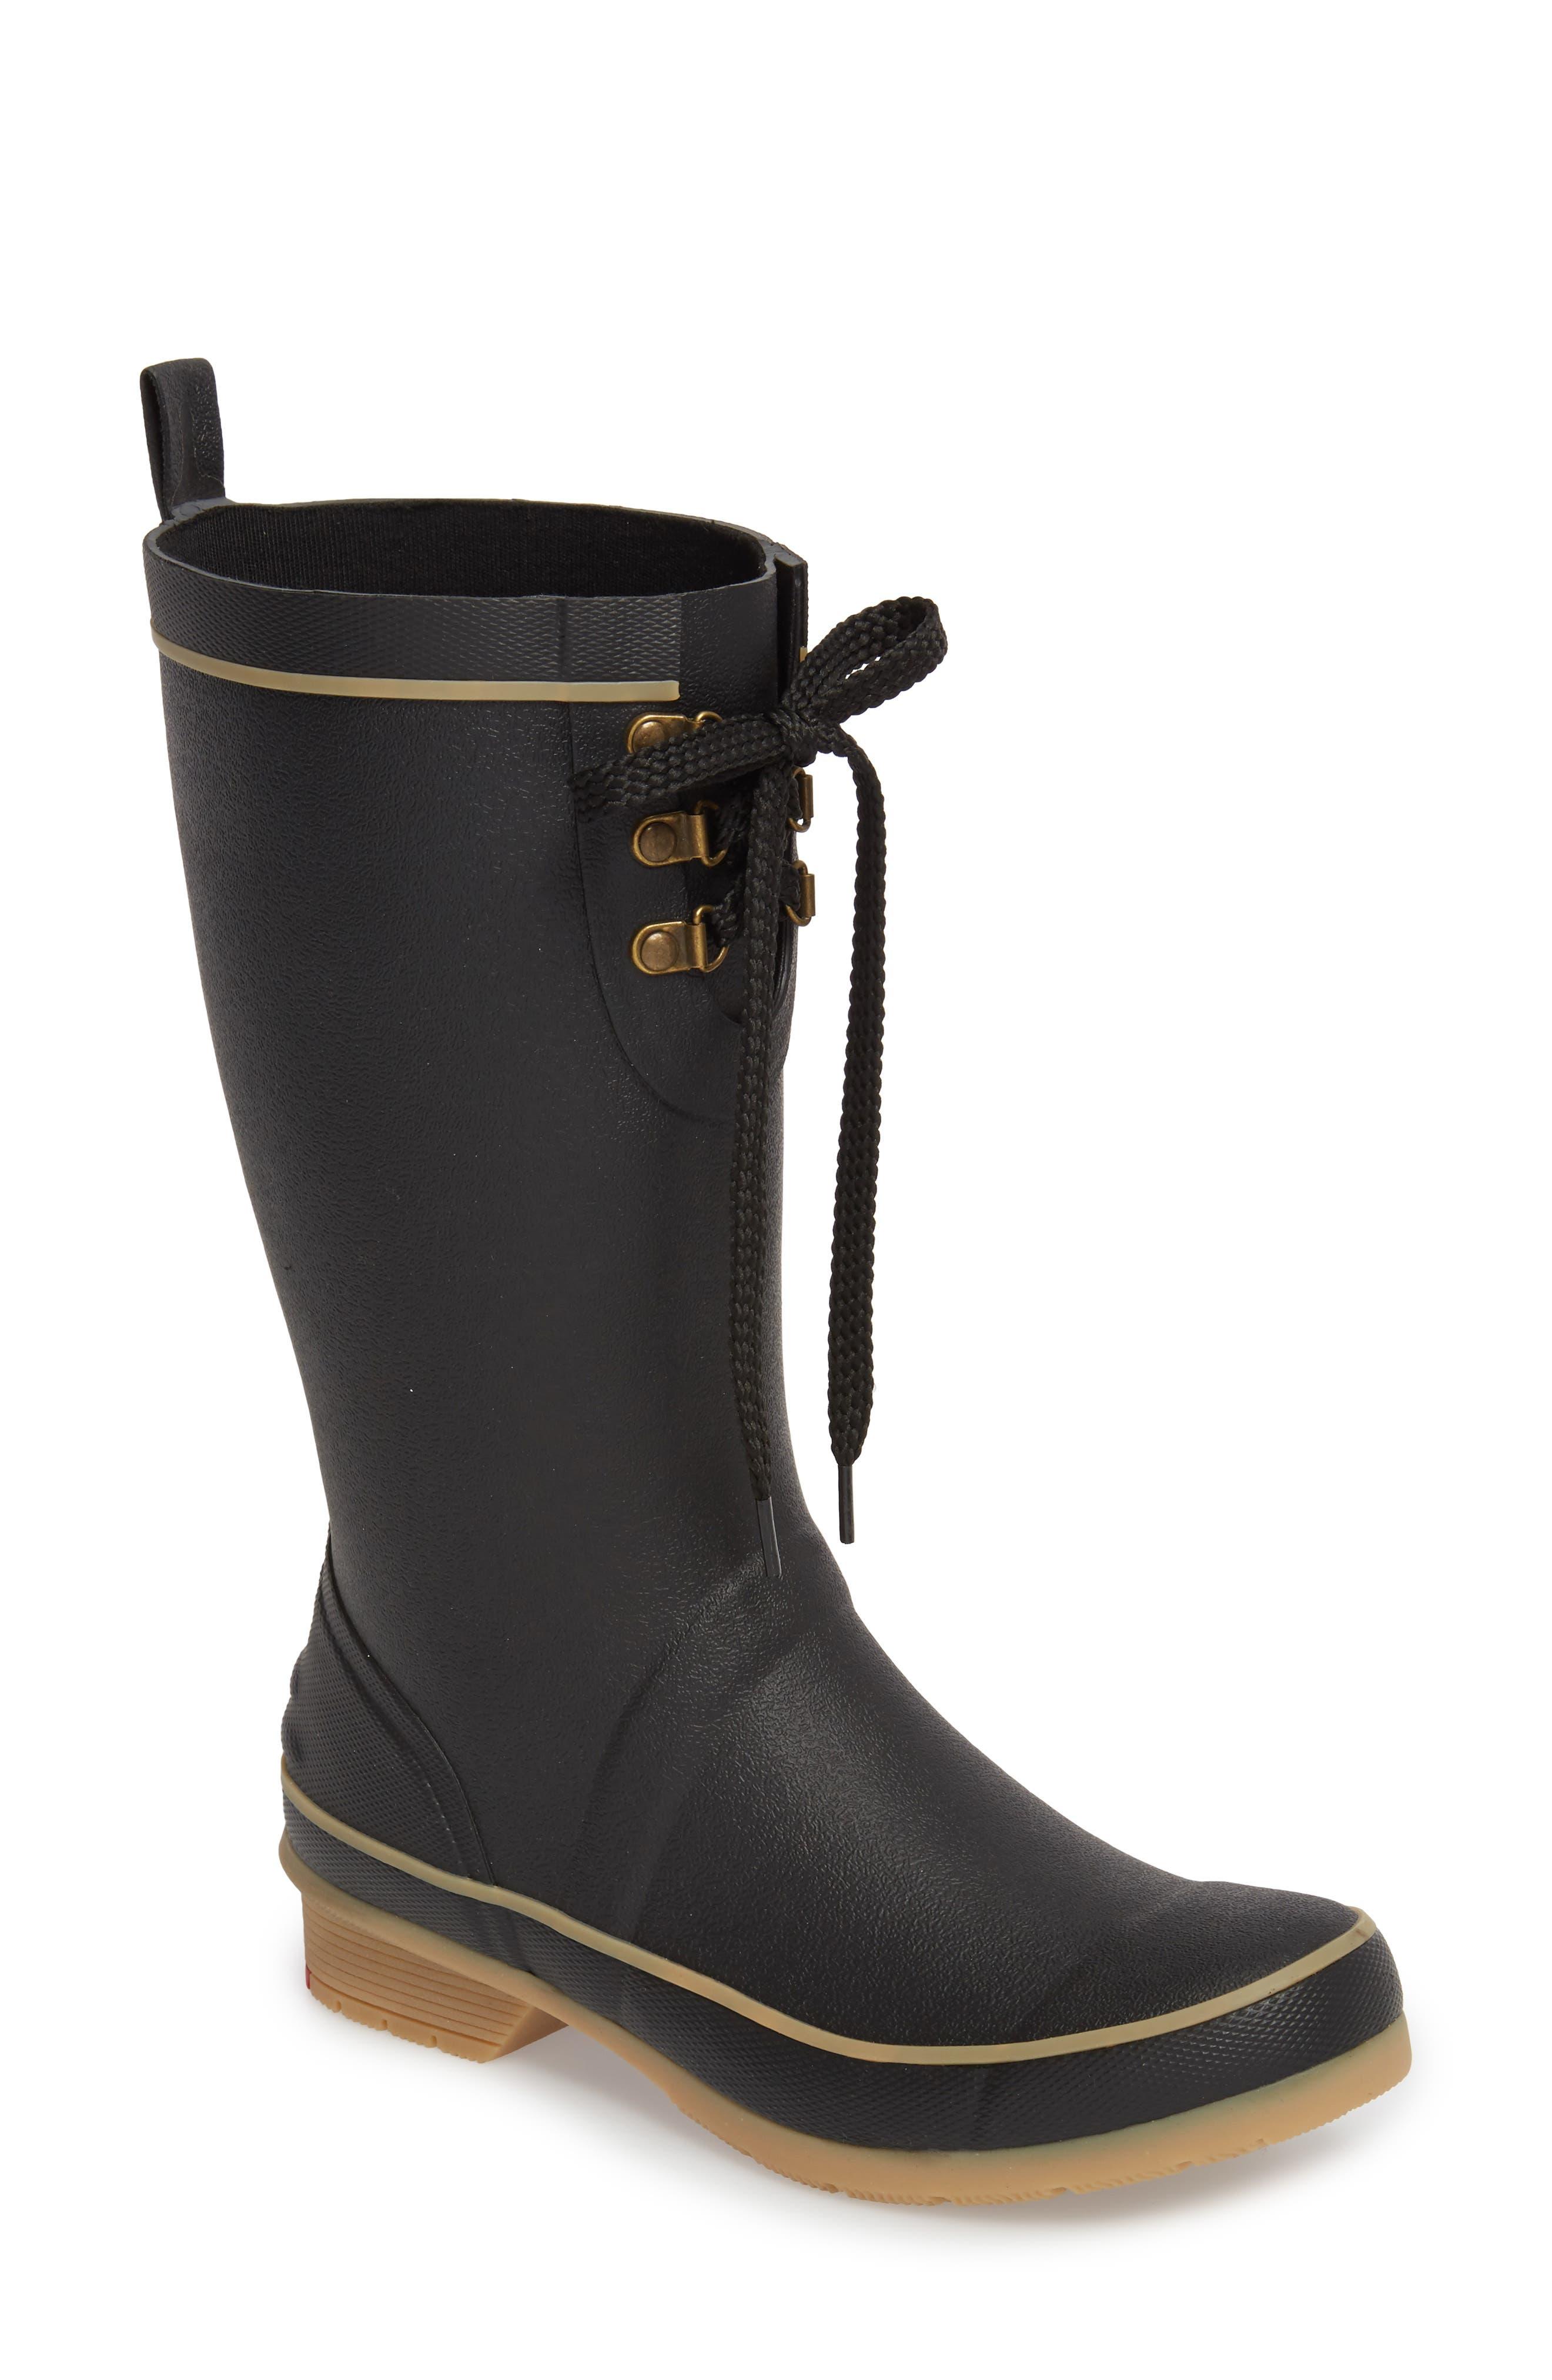 Chooka Whidbey Rain Boots